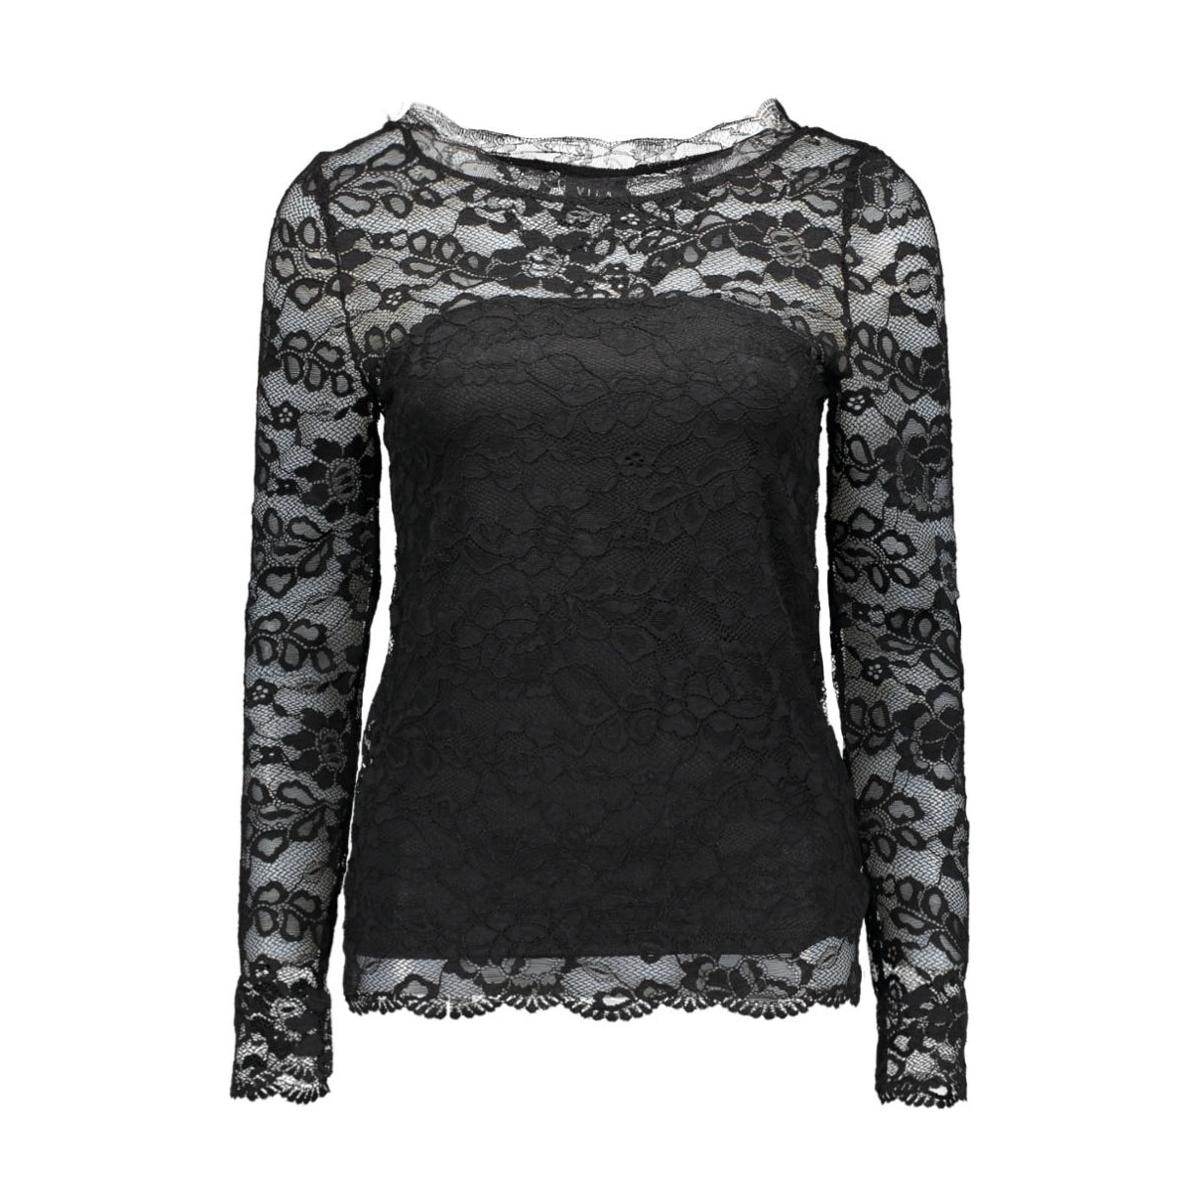 vijanna l/s top 14036935 vila t-shirt black